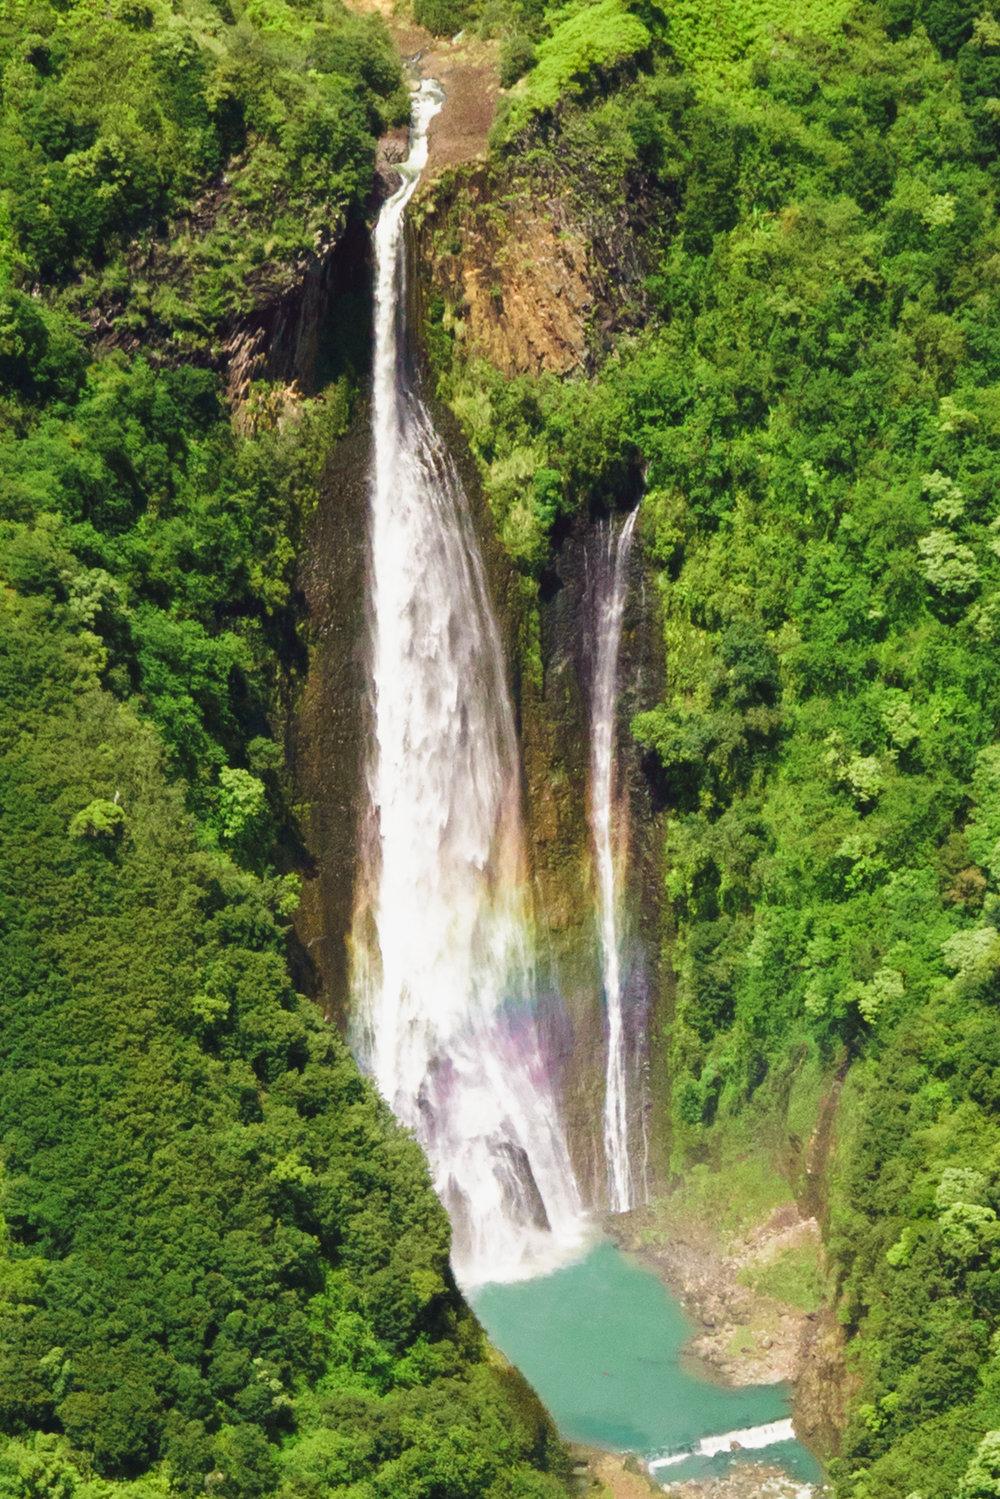 Manawaiopuna Falls (Jurassic Park Falls) | Never Settle Travel